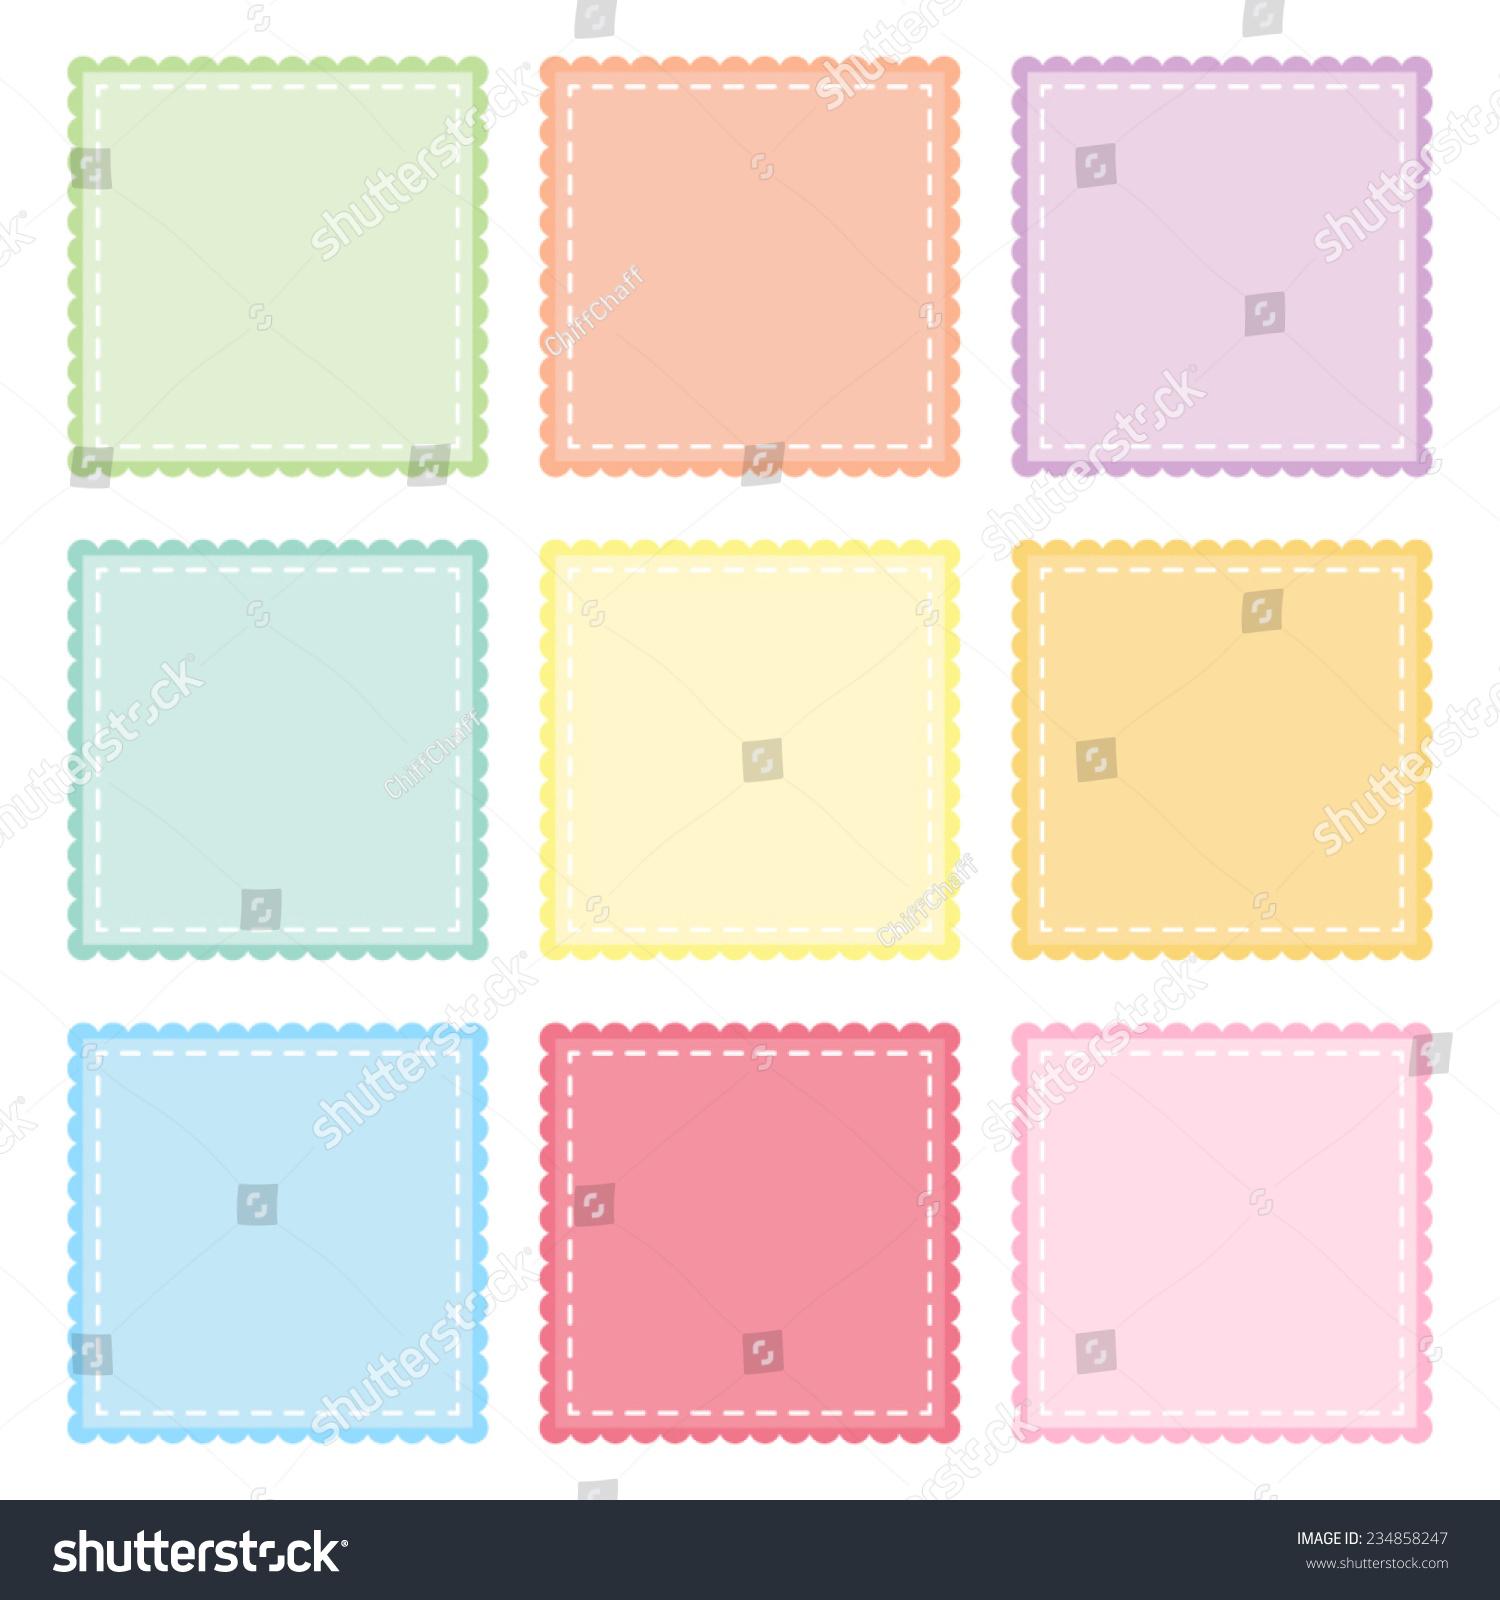 Scalloped Edge Stitched Square Badge Vector Stock-Vektorgrafik ...